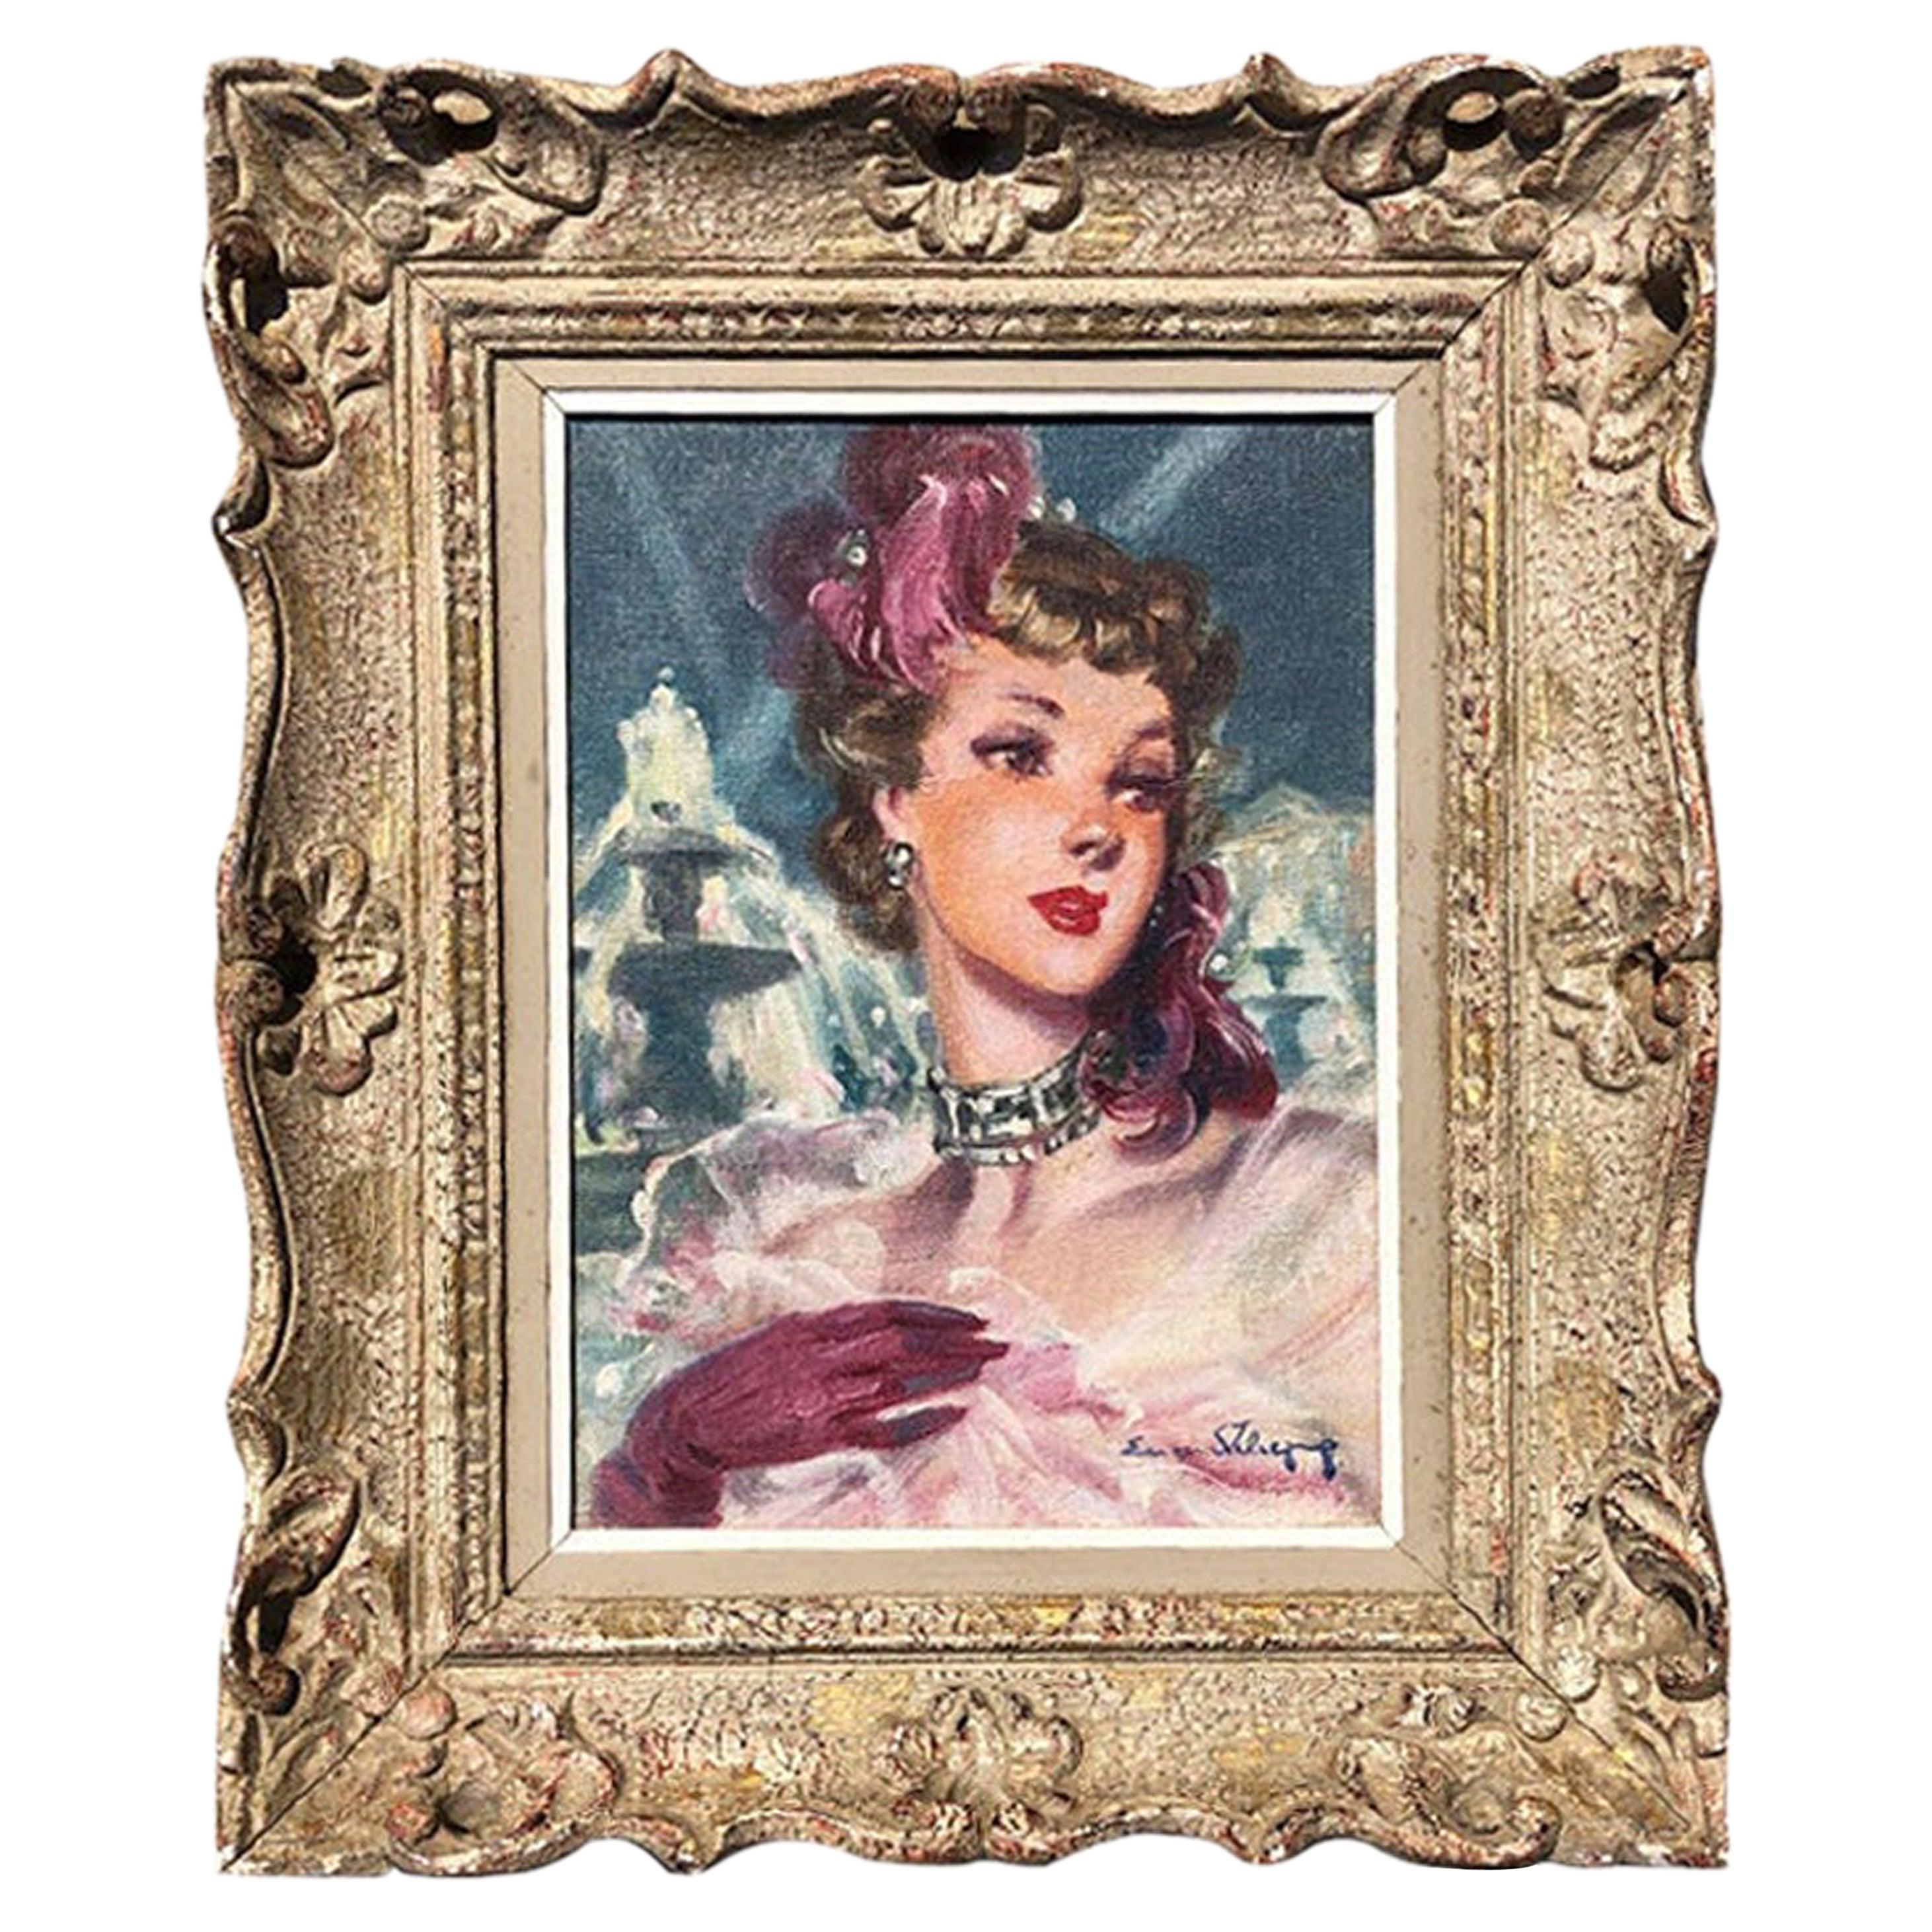 Eugene Lelievre Portrait Oil on Canvas Painting Signed and Framed 1920s France